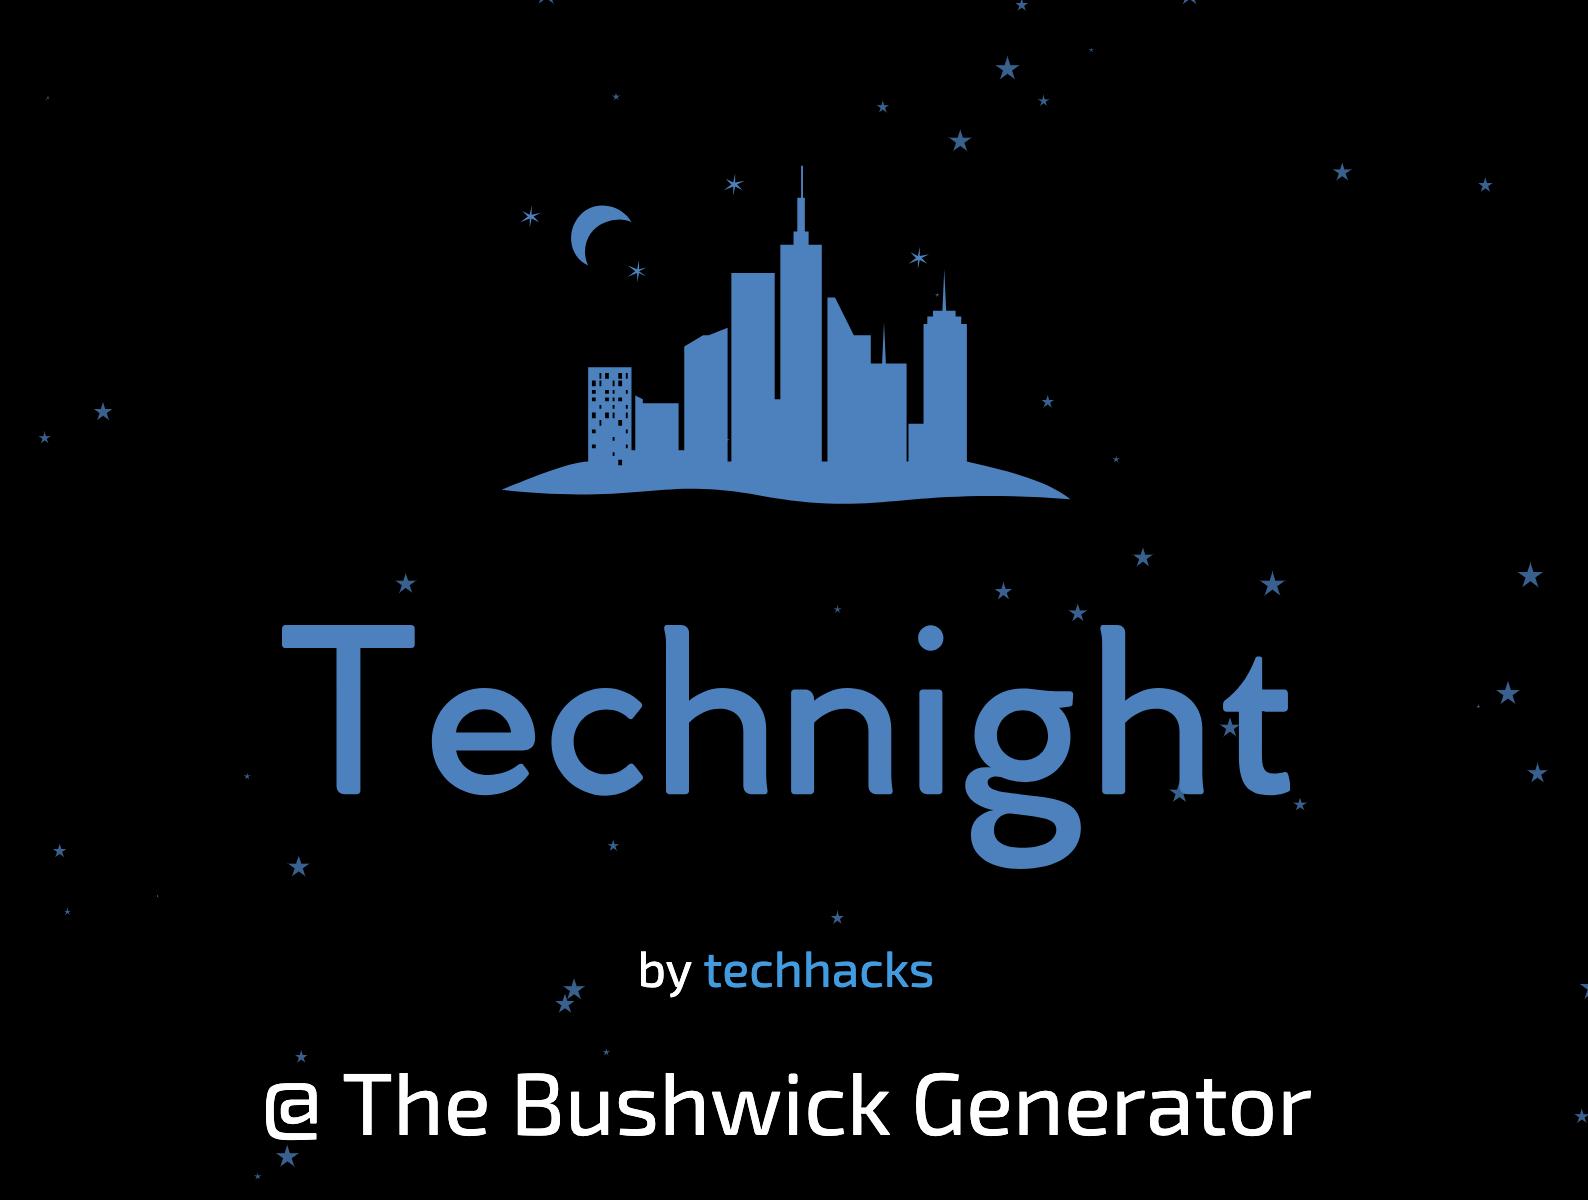 Technight-techhacks-bushwick-generator.png